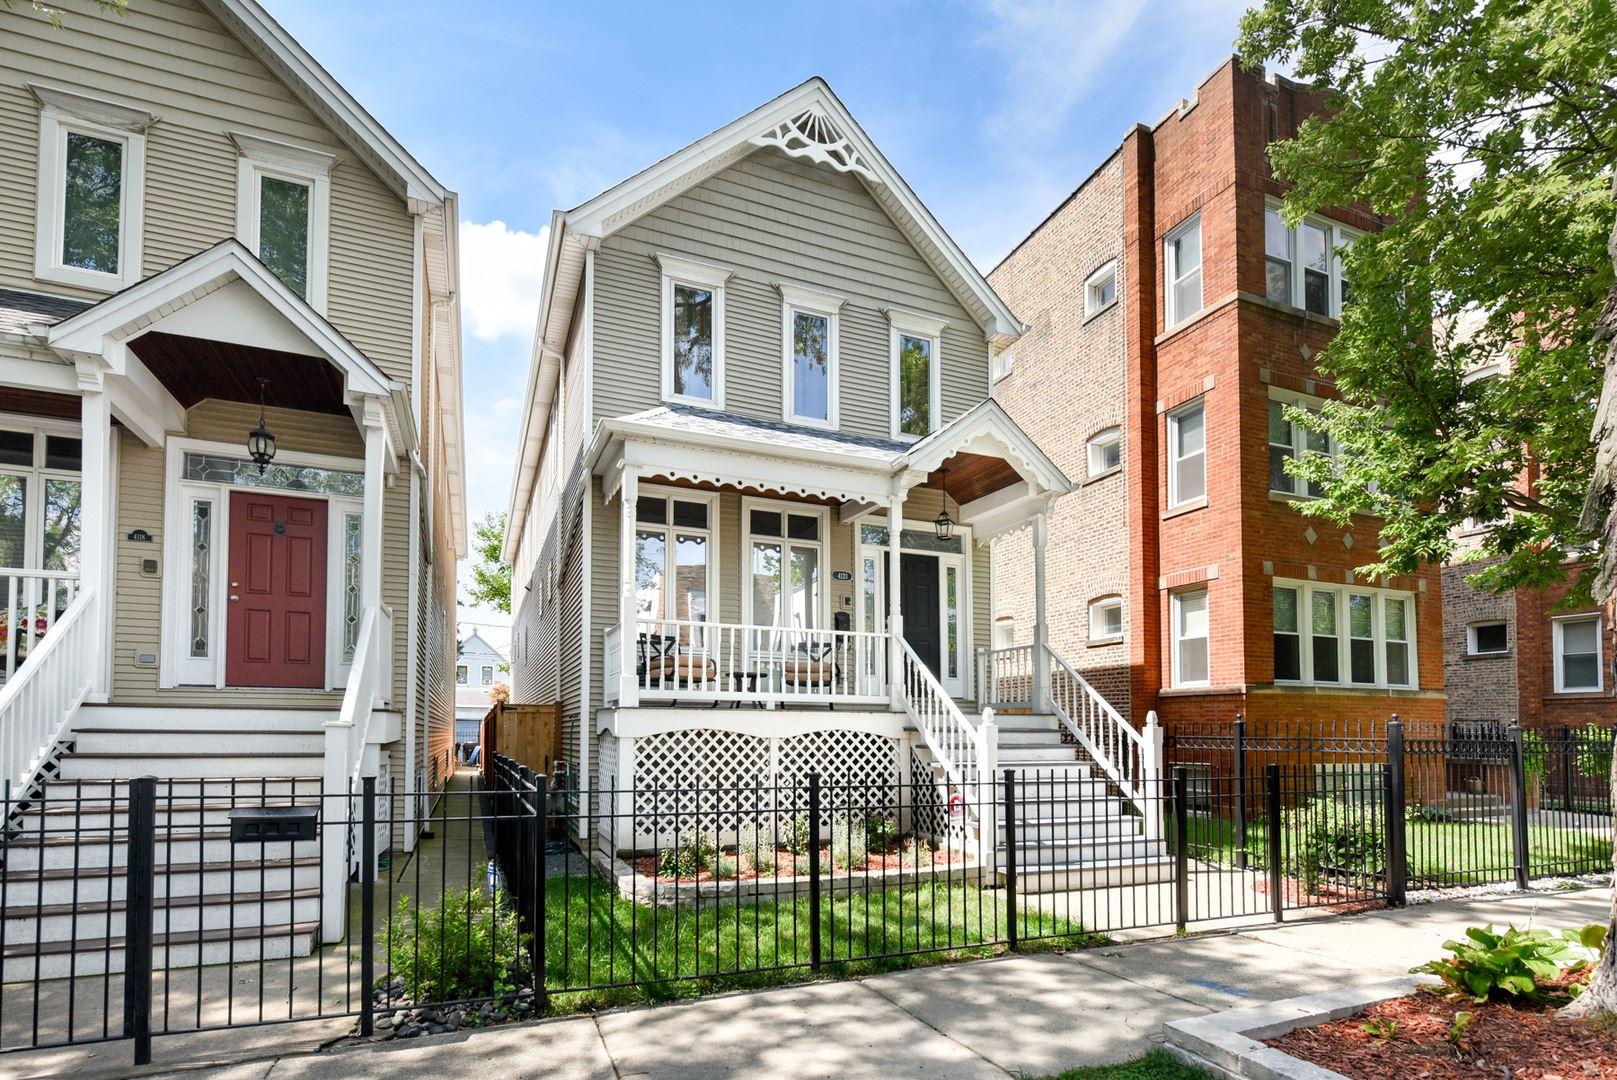 4120 N Whipple Street, Chicago, IL 60618 - #: 11211239